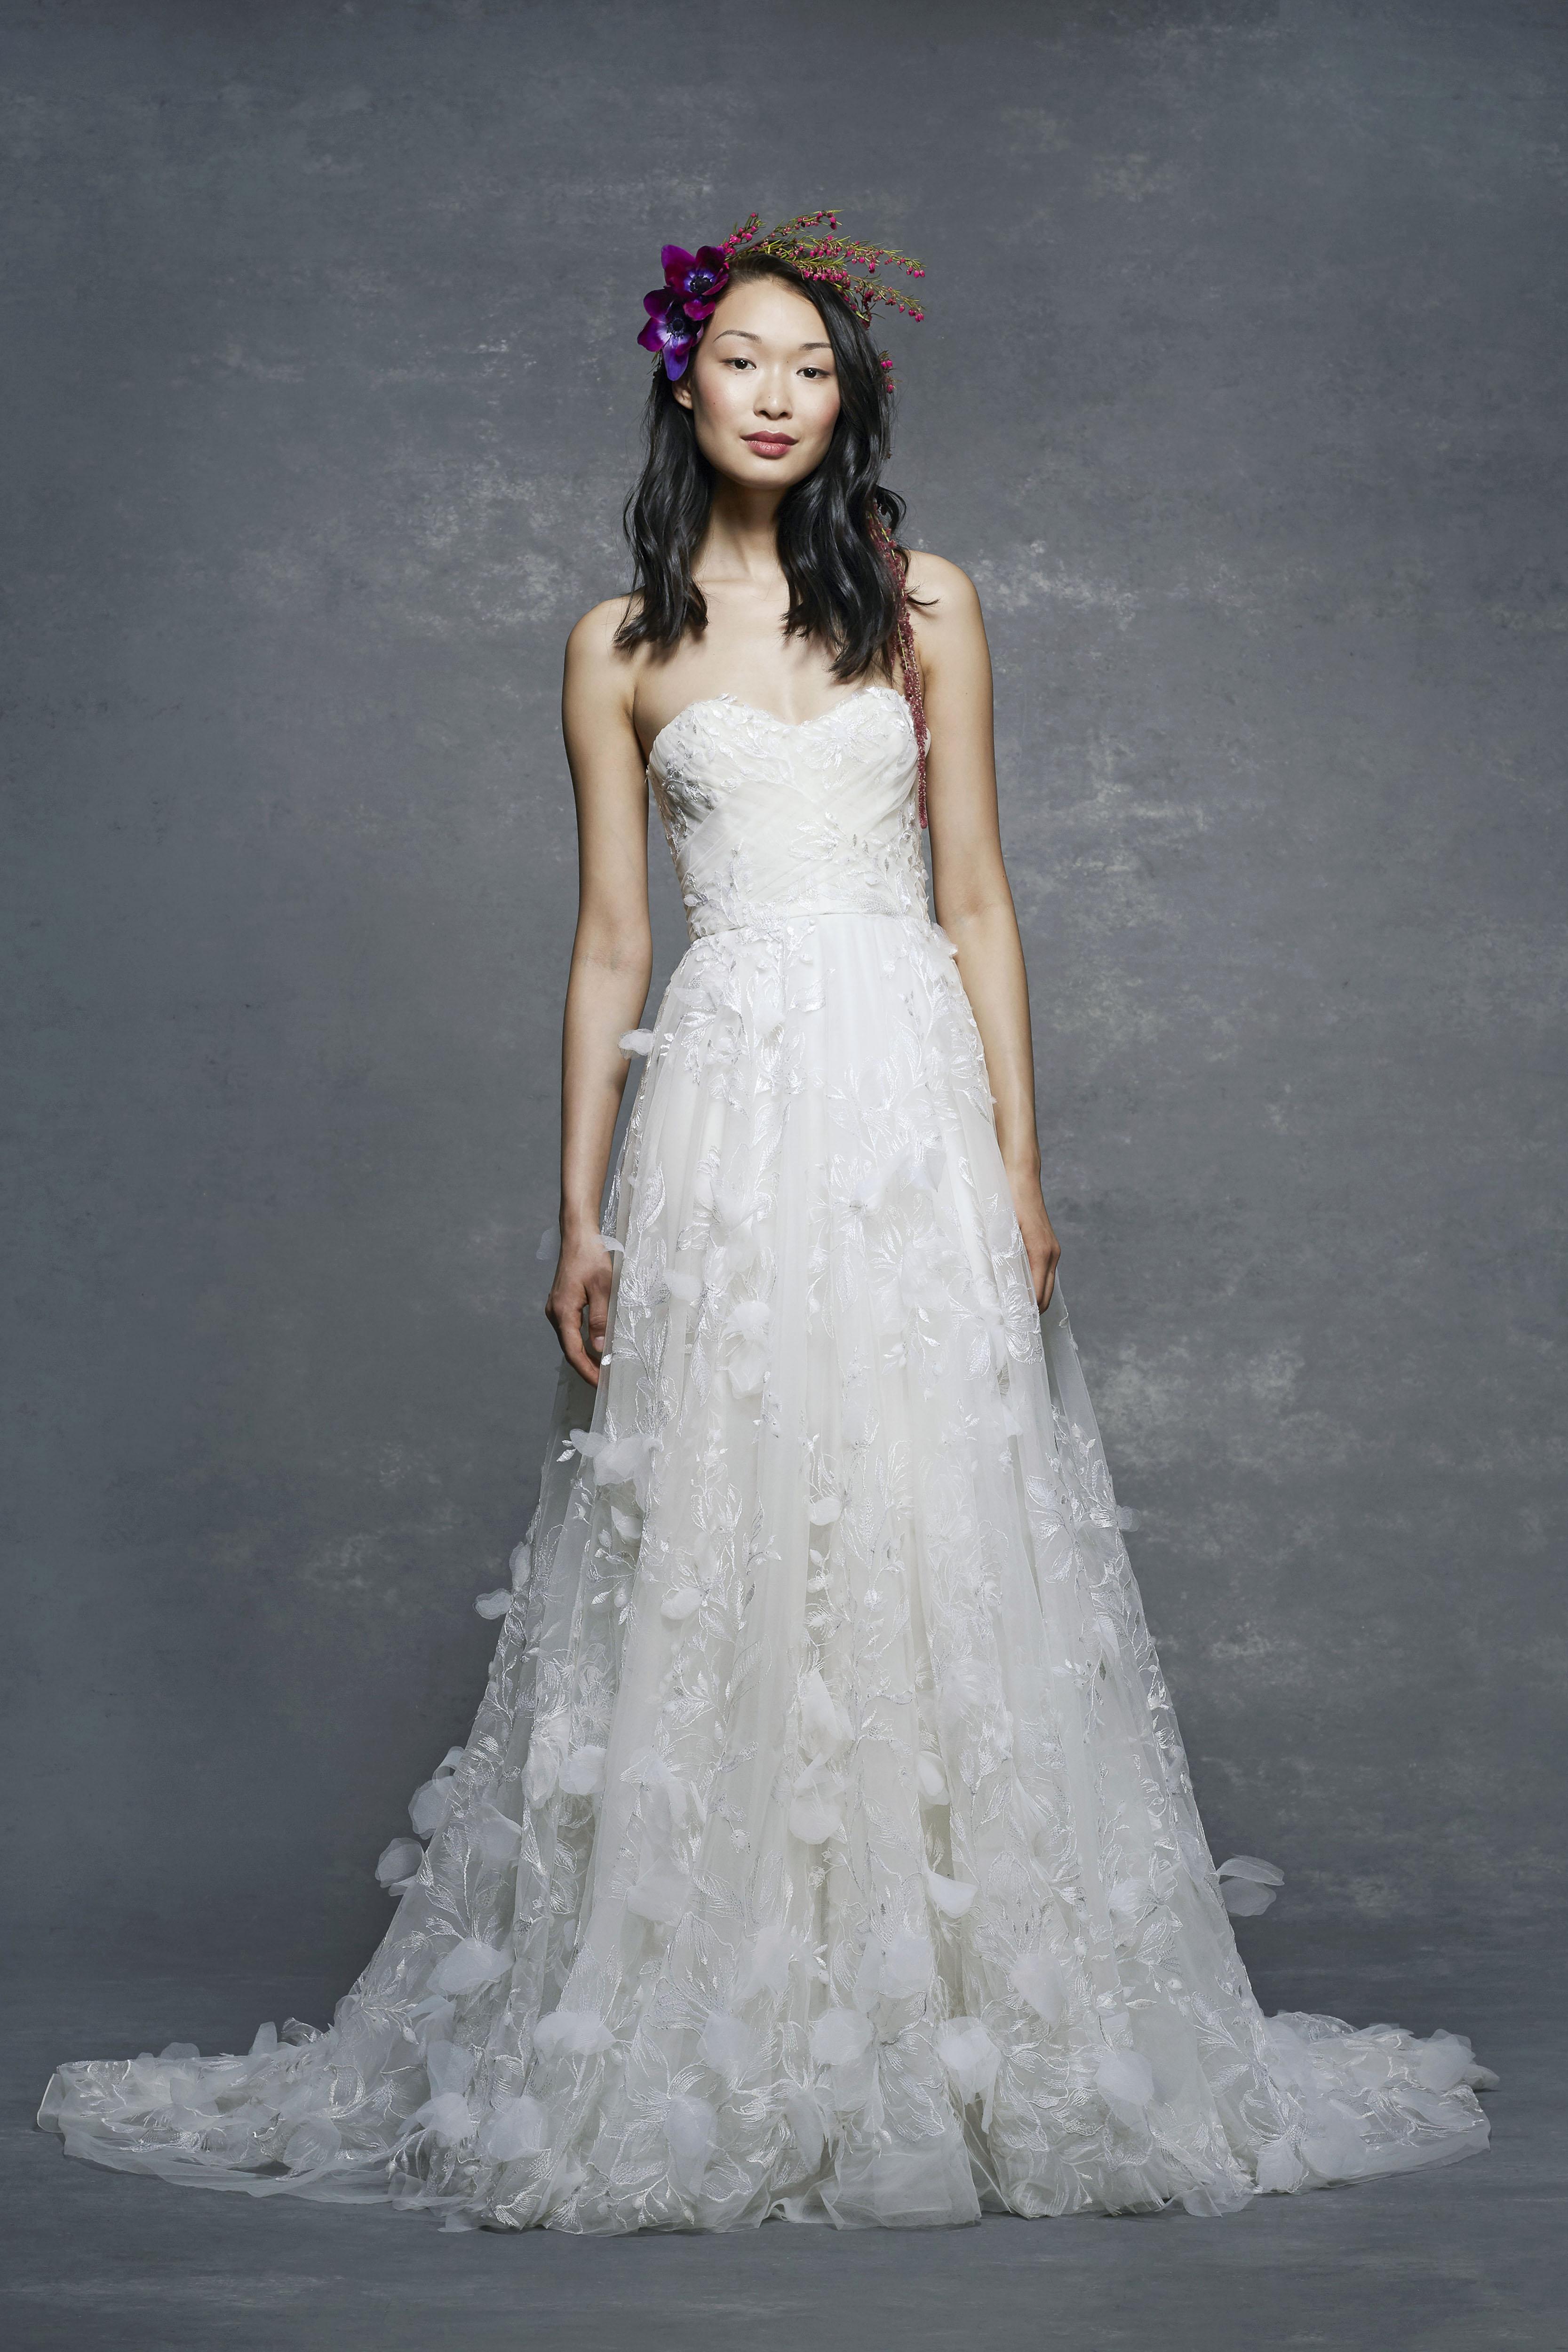 marchesa notte bridal wedding dress off-the-shoulder sweetheart